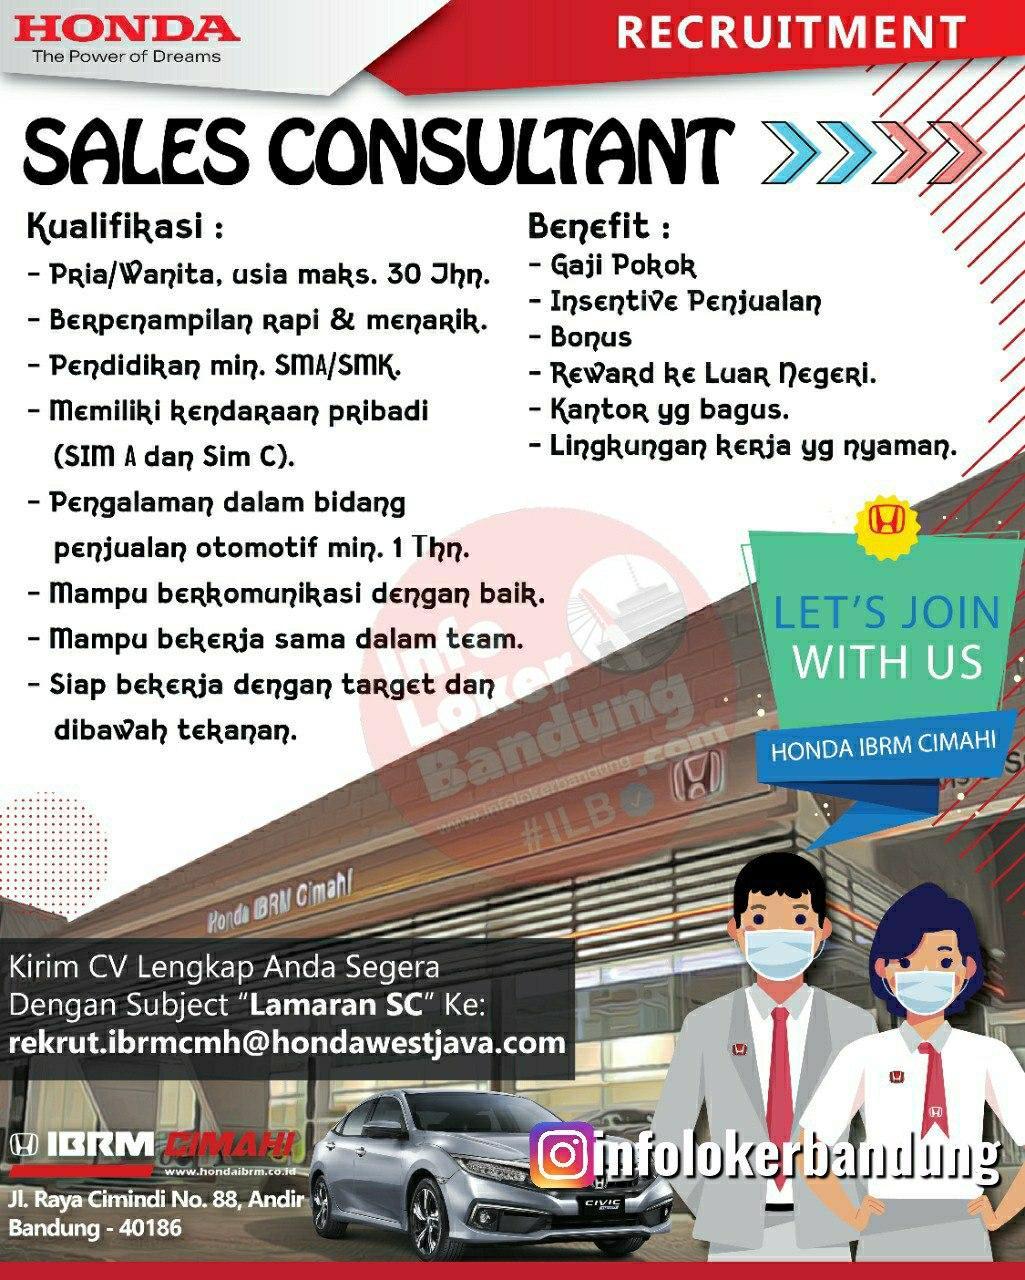 Lowongan Kerja Sales Consultant Honda IBRM Cimahi Juli 2020